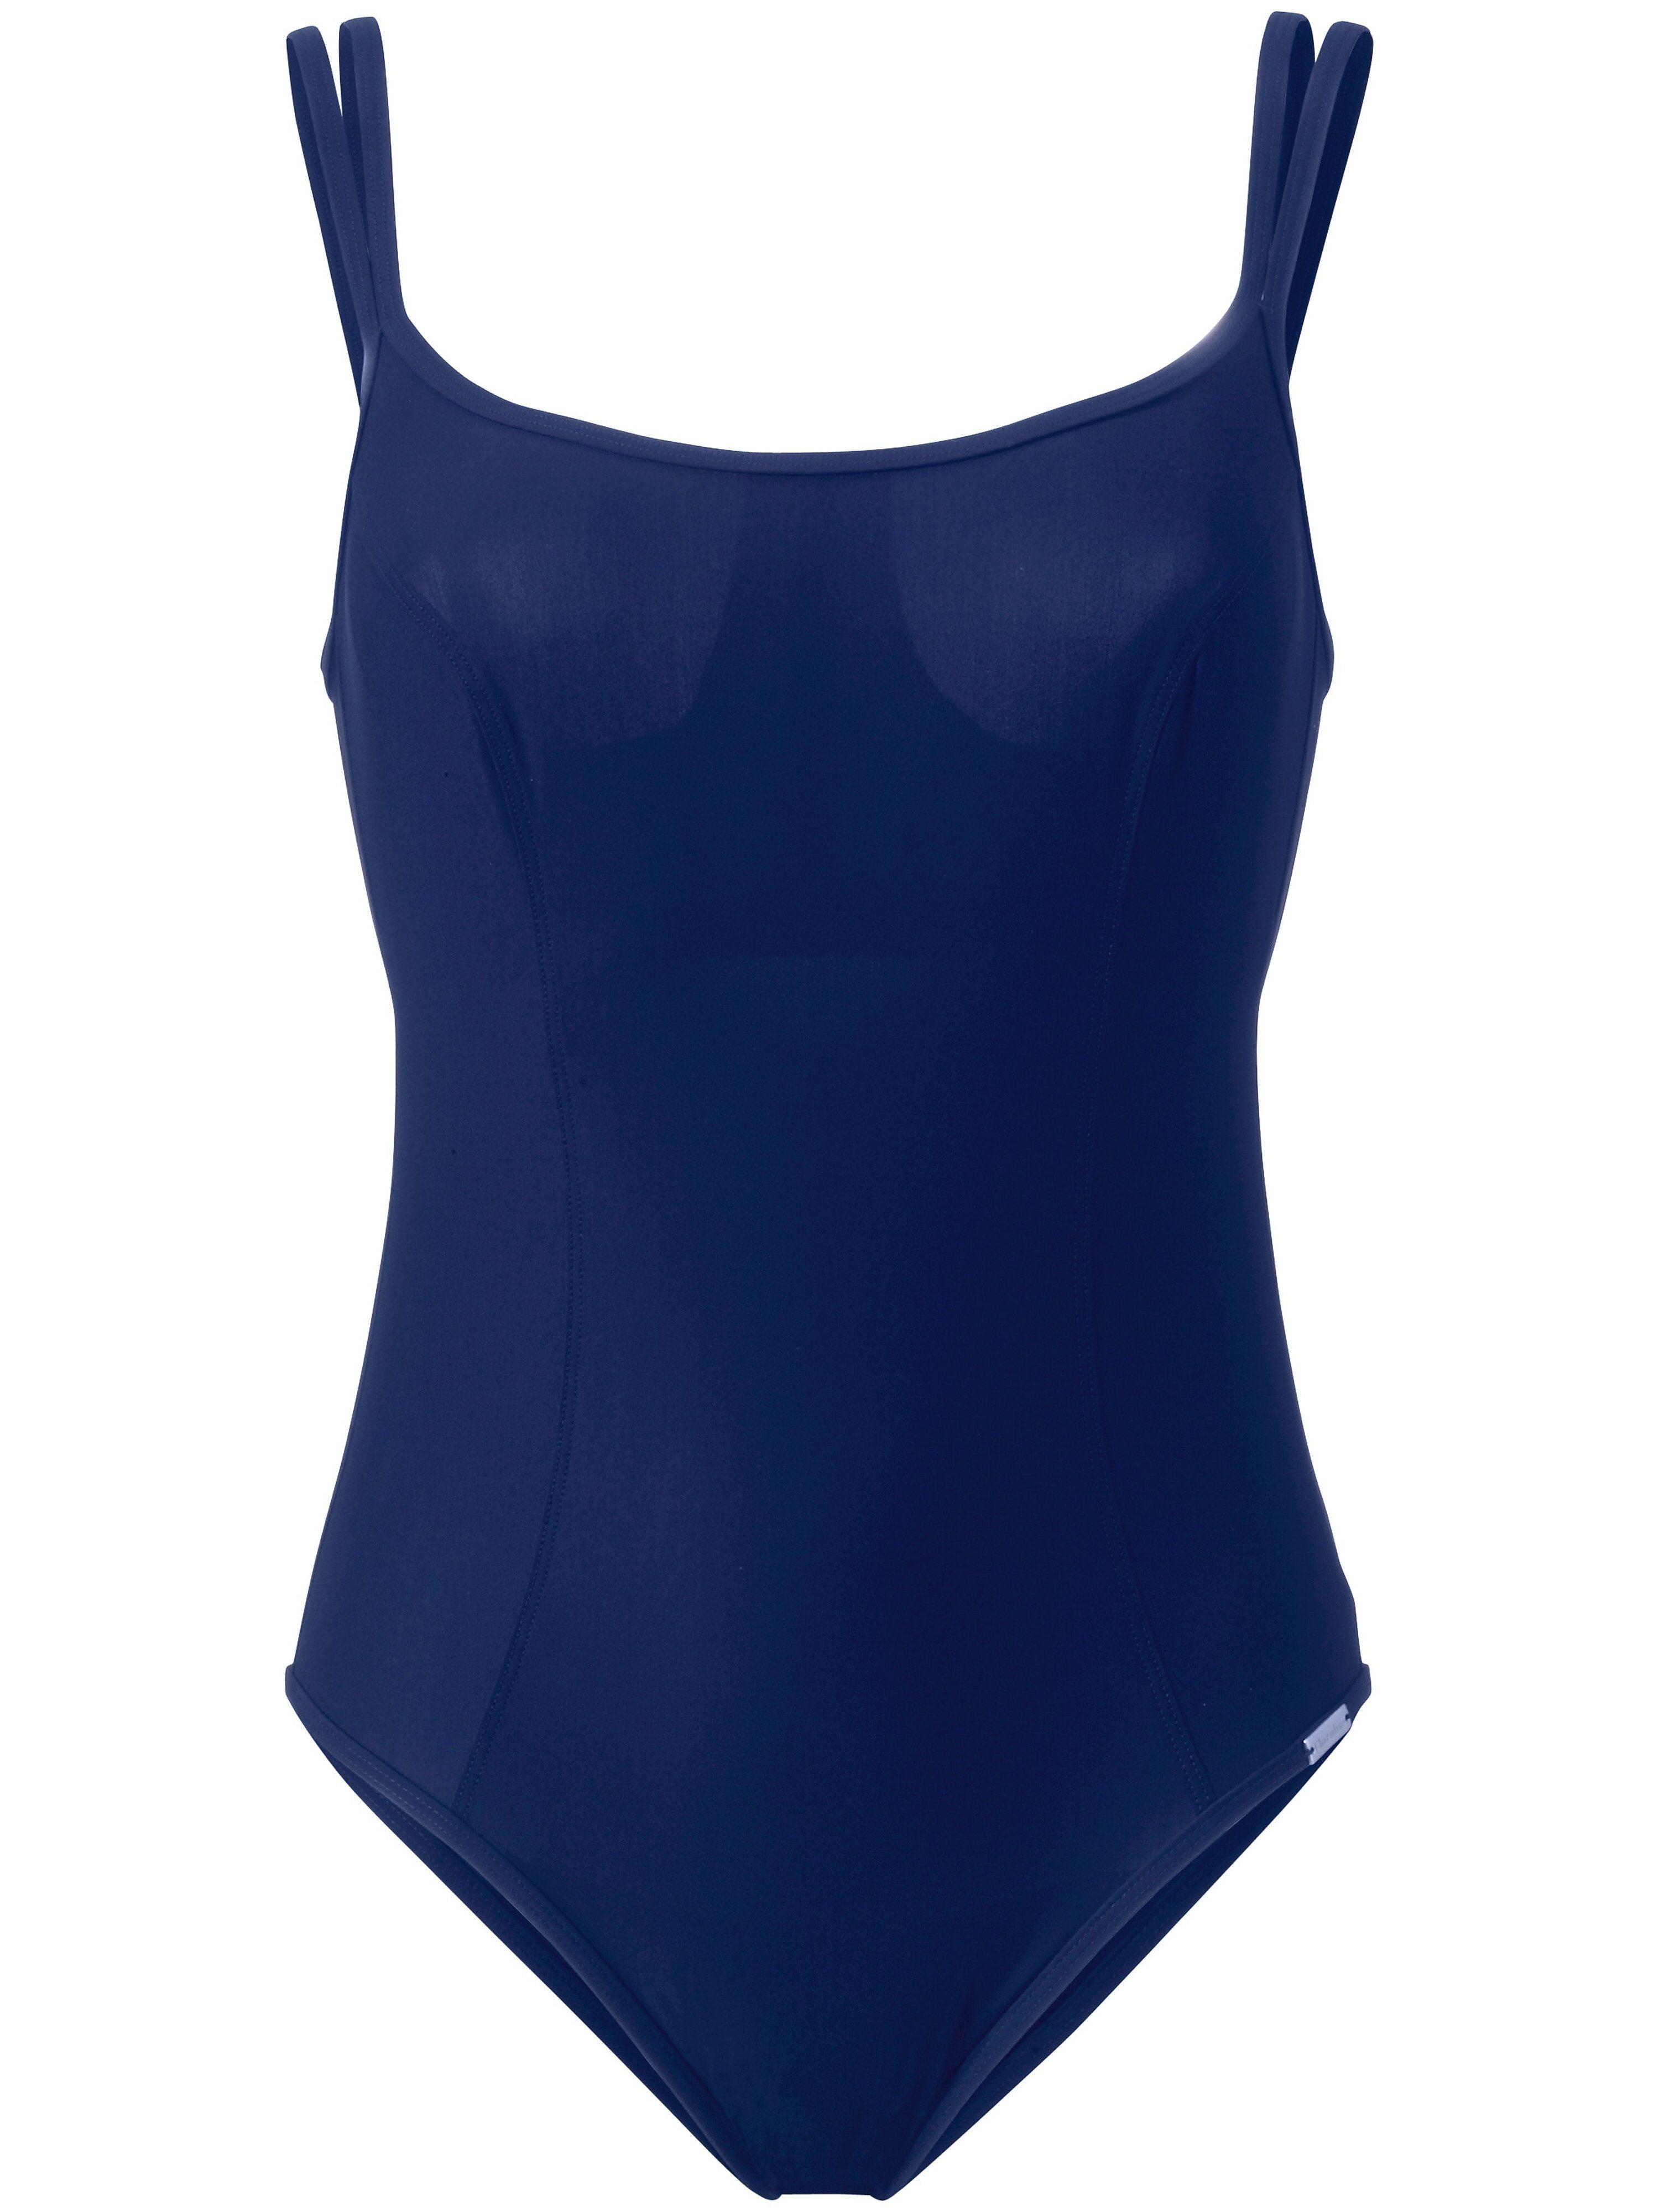 Charmline Le maillot bain  Charmline bleu  - Femme - 40